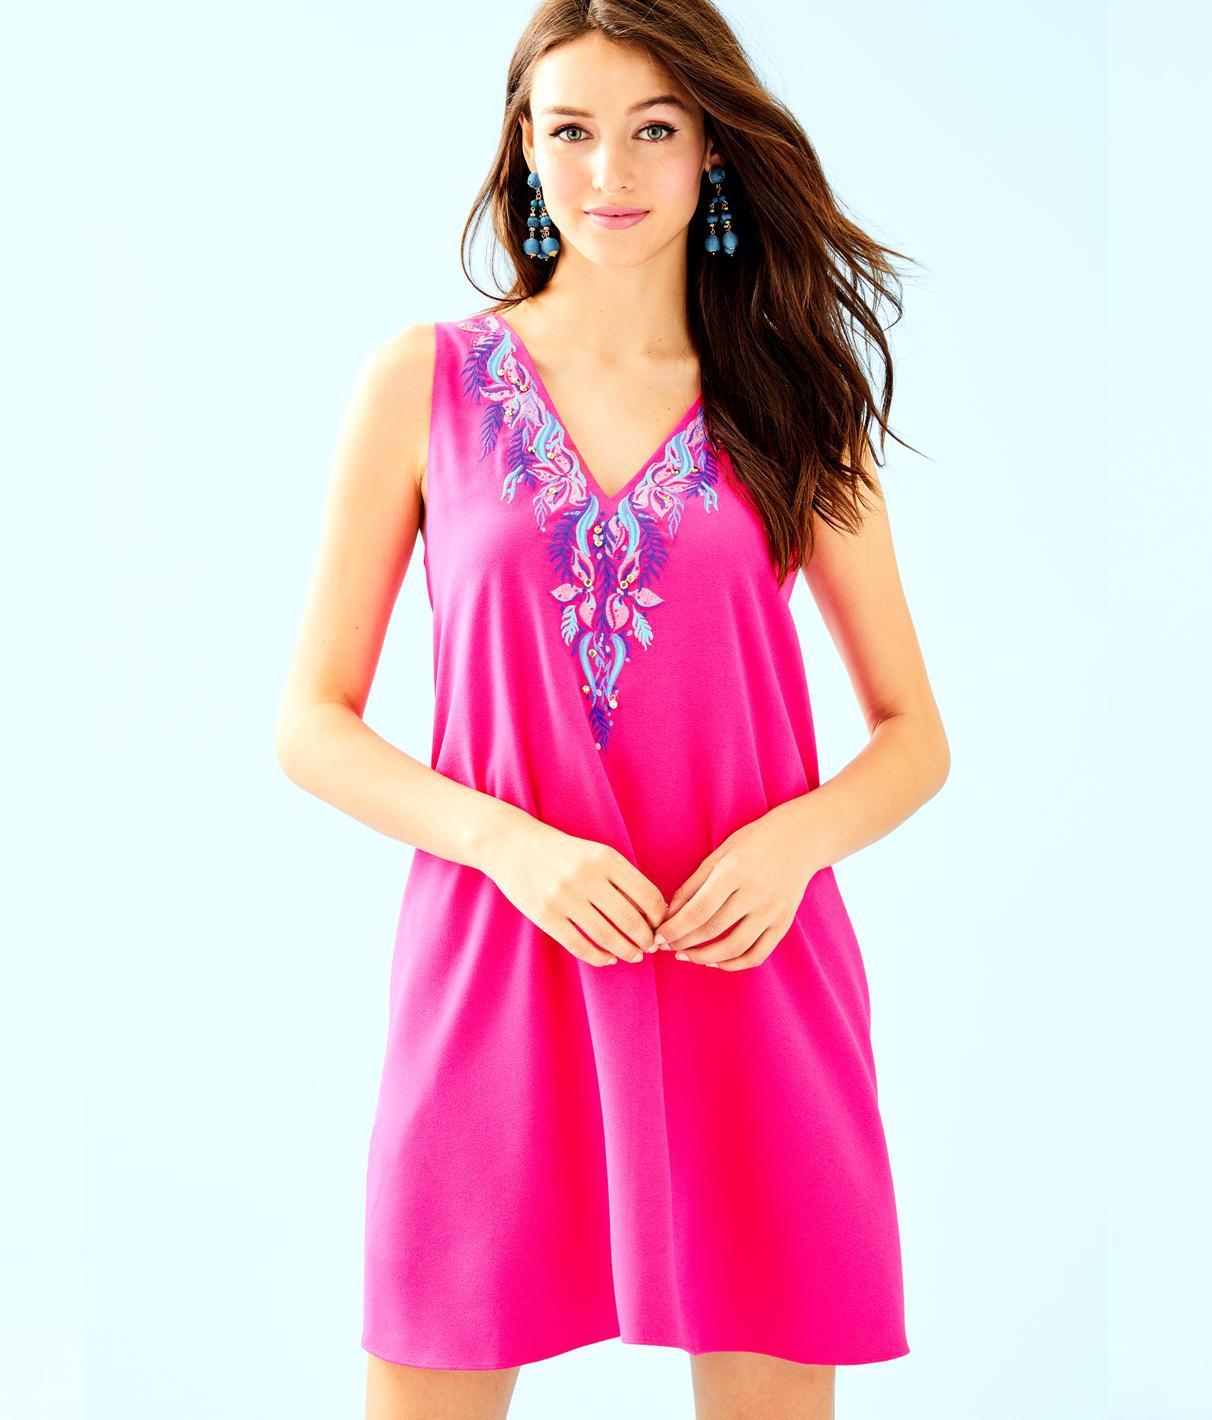 e1675c9ceab524 Lilly Pulitzer Owen Dress In Pinata Pink | ModeSens